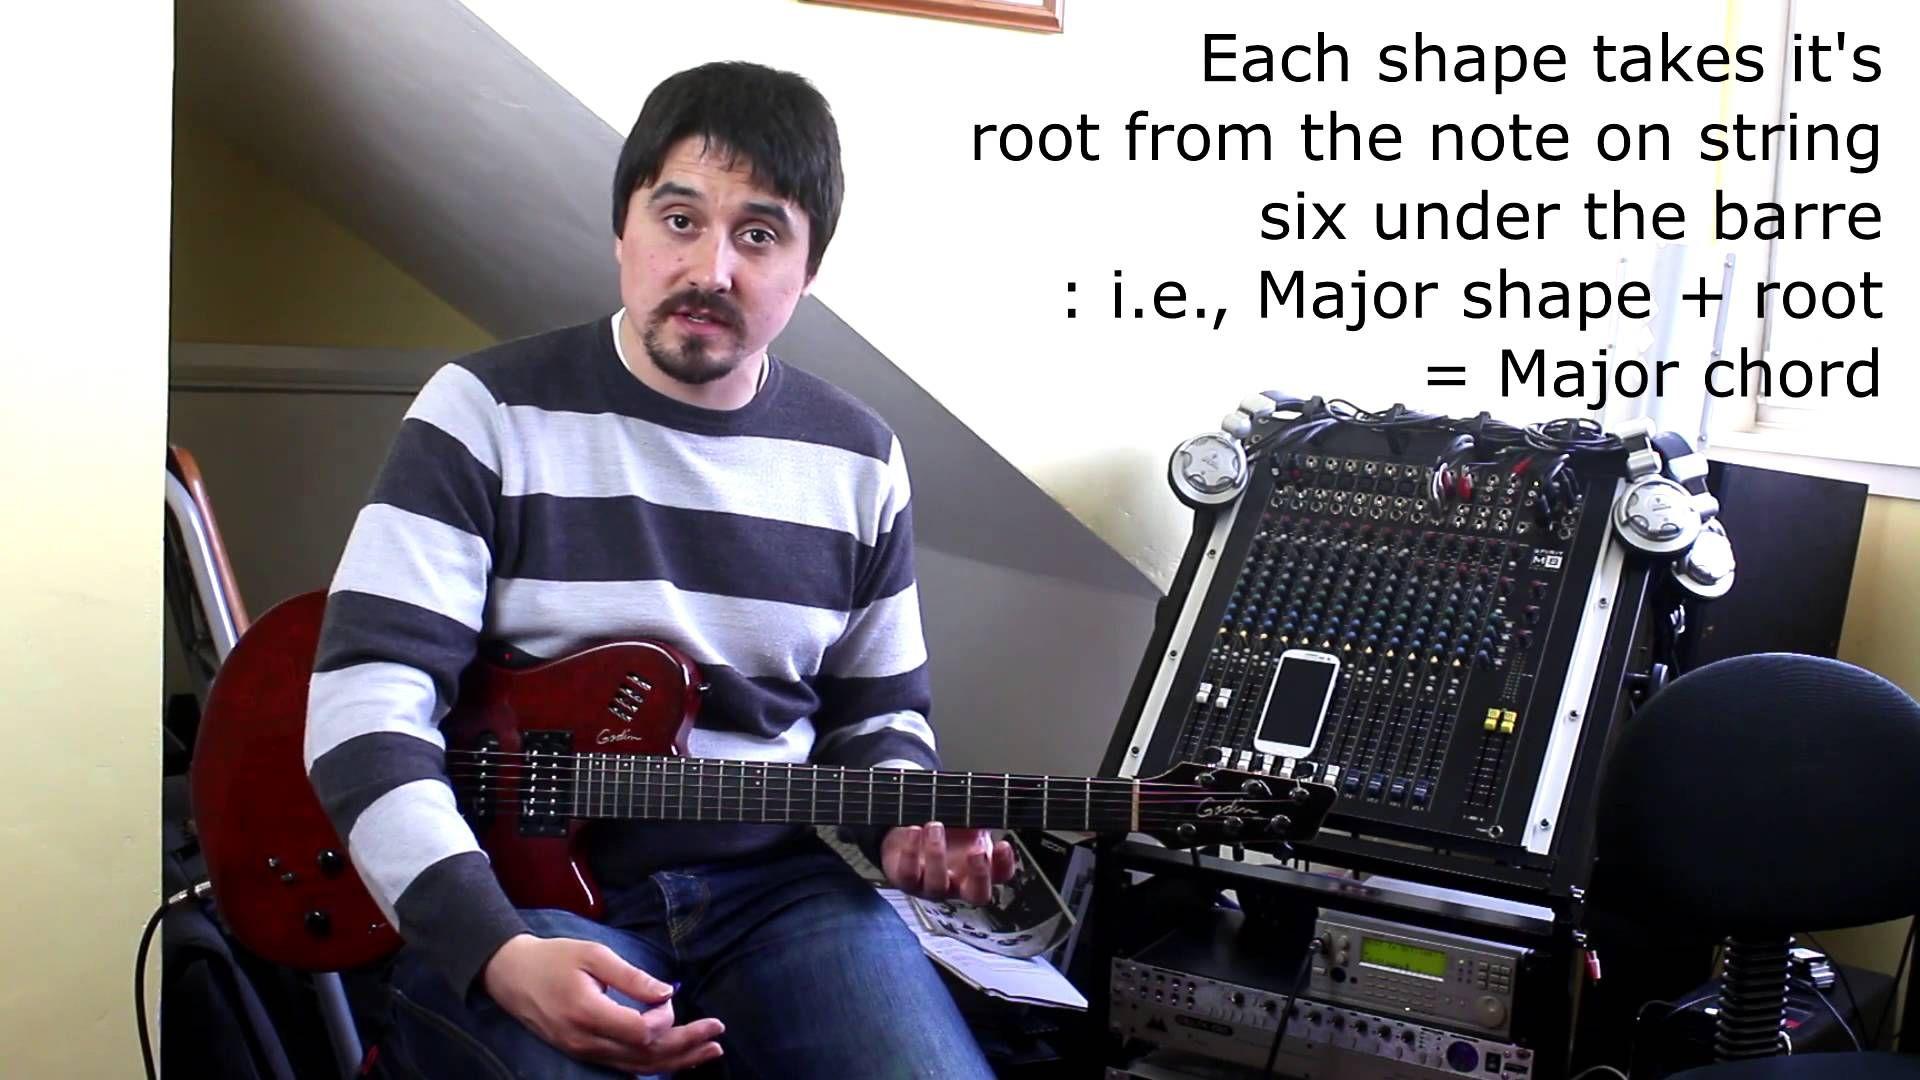 Barre chords 2 chord shape concepts guitar guitar